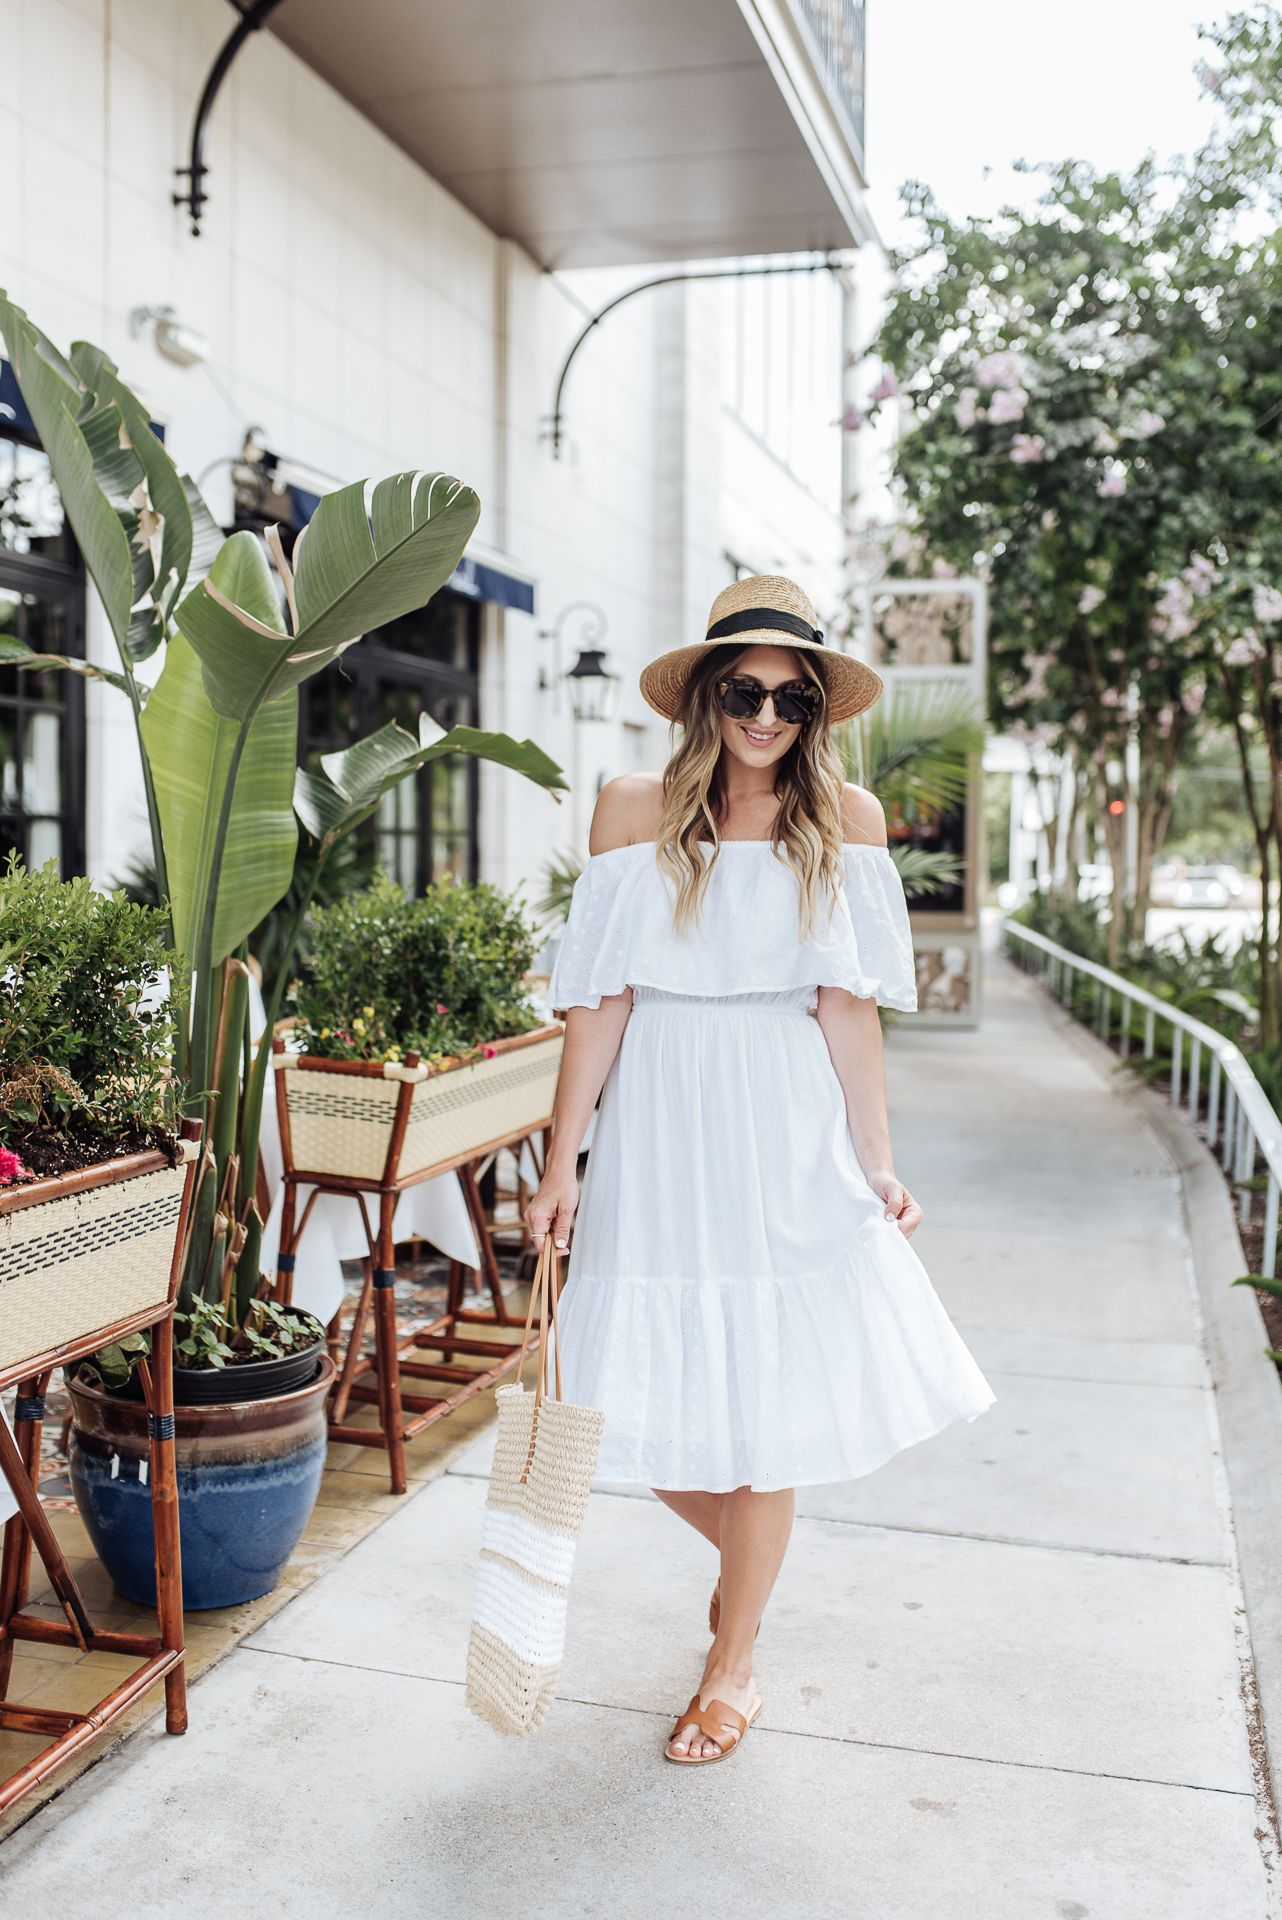 Walmart Fashion Summer Finds Dresses Little White Dresses White Off Shoulder [ 1920 x 1282 Pixel ]